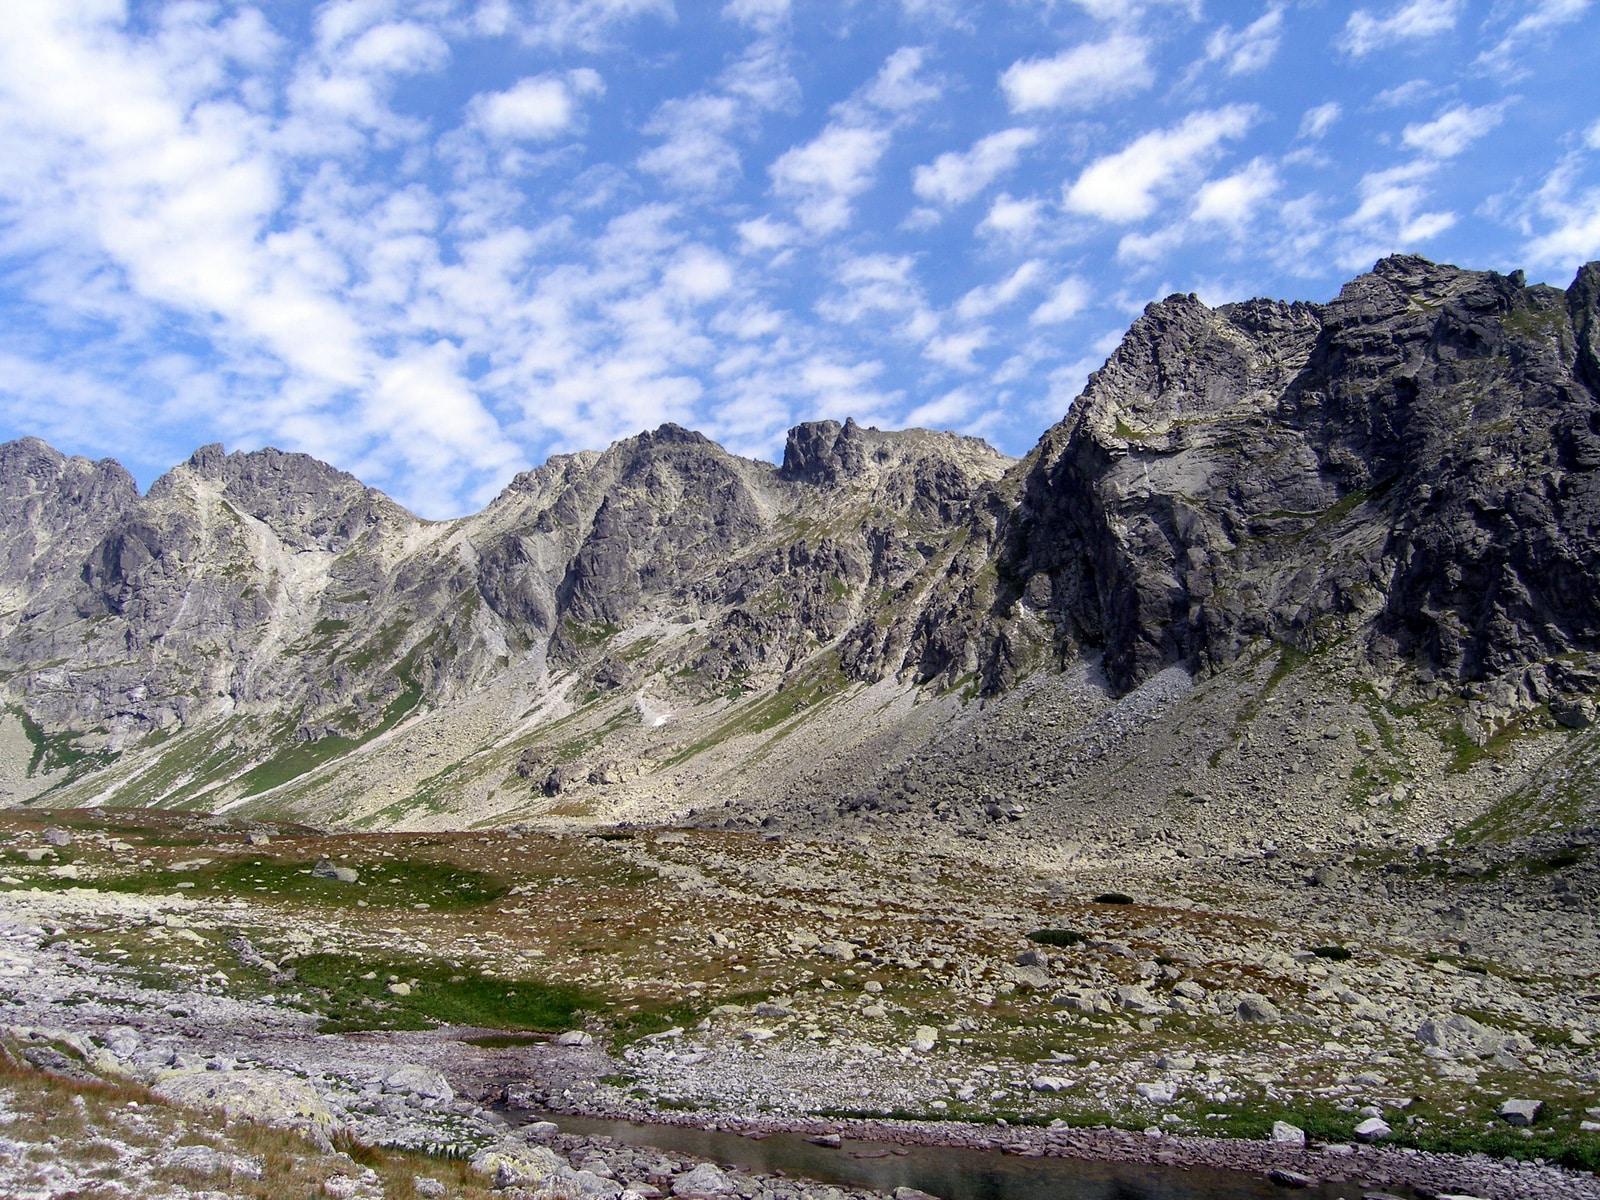 1-Day Hike to Koprovsky Stit in the High Tatras